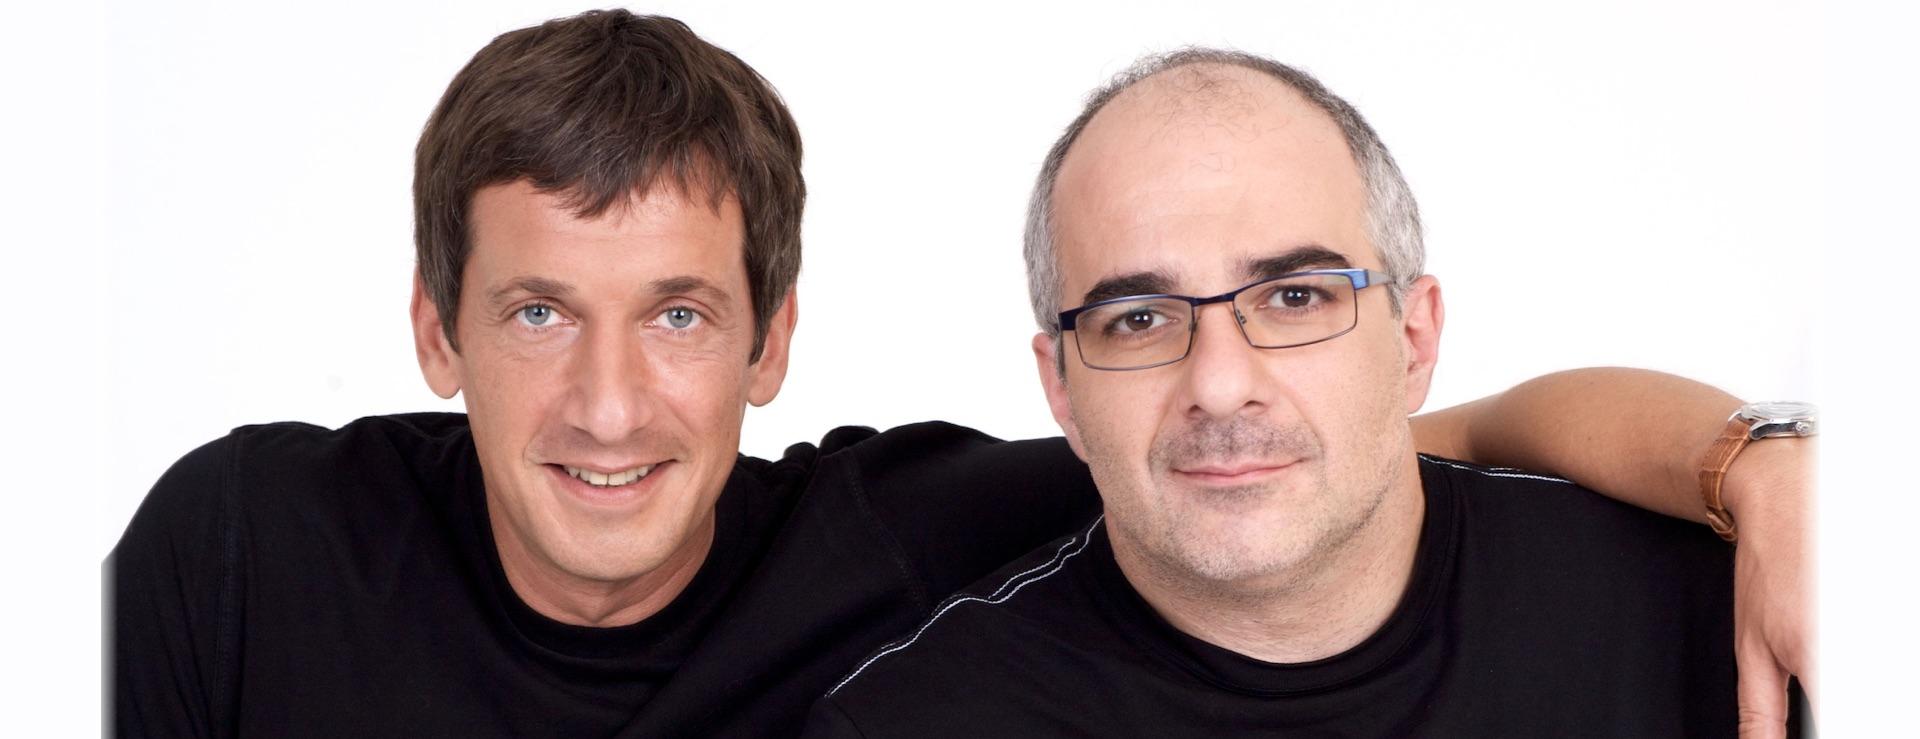 Gernot & Niavarani - 2 Musterknaben